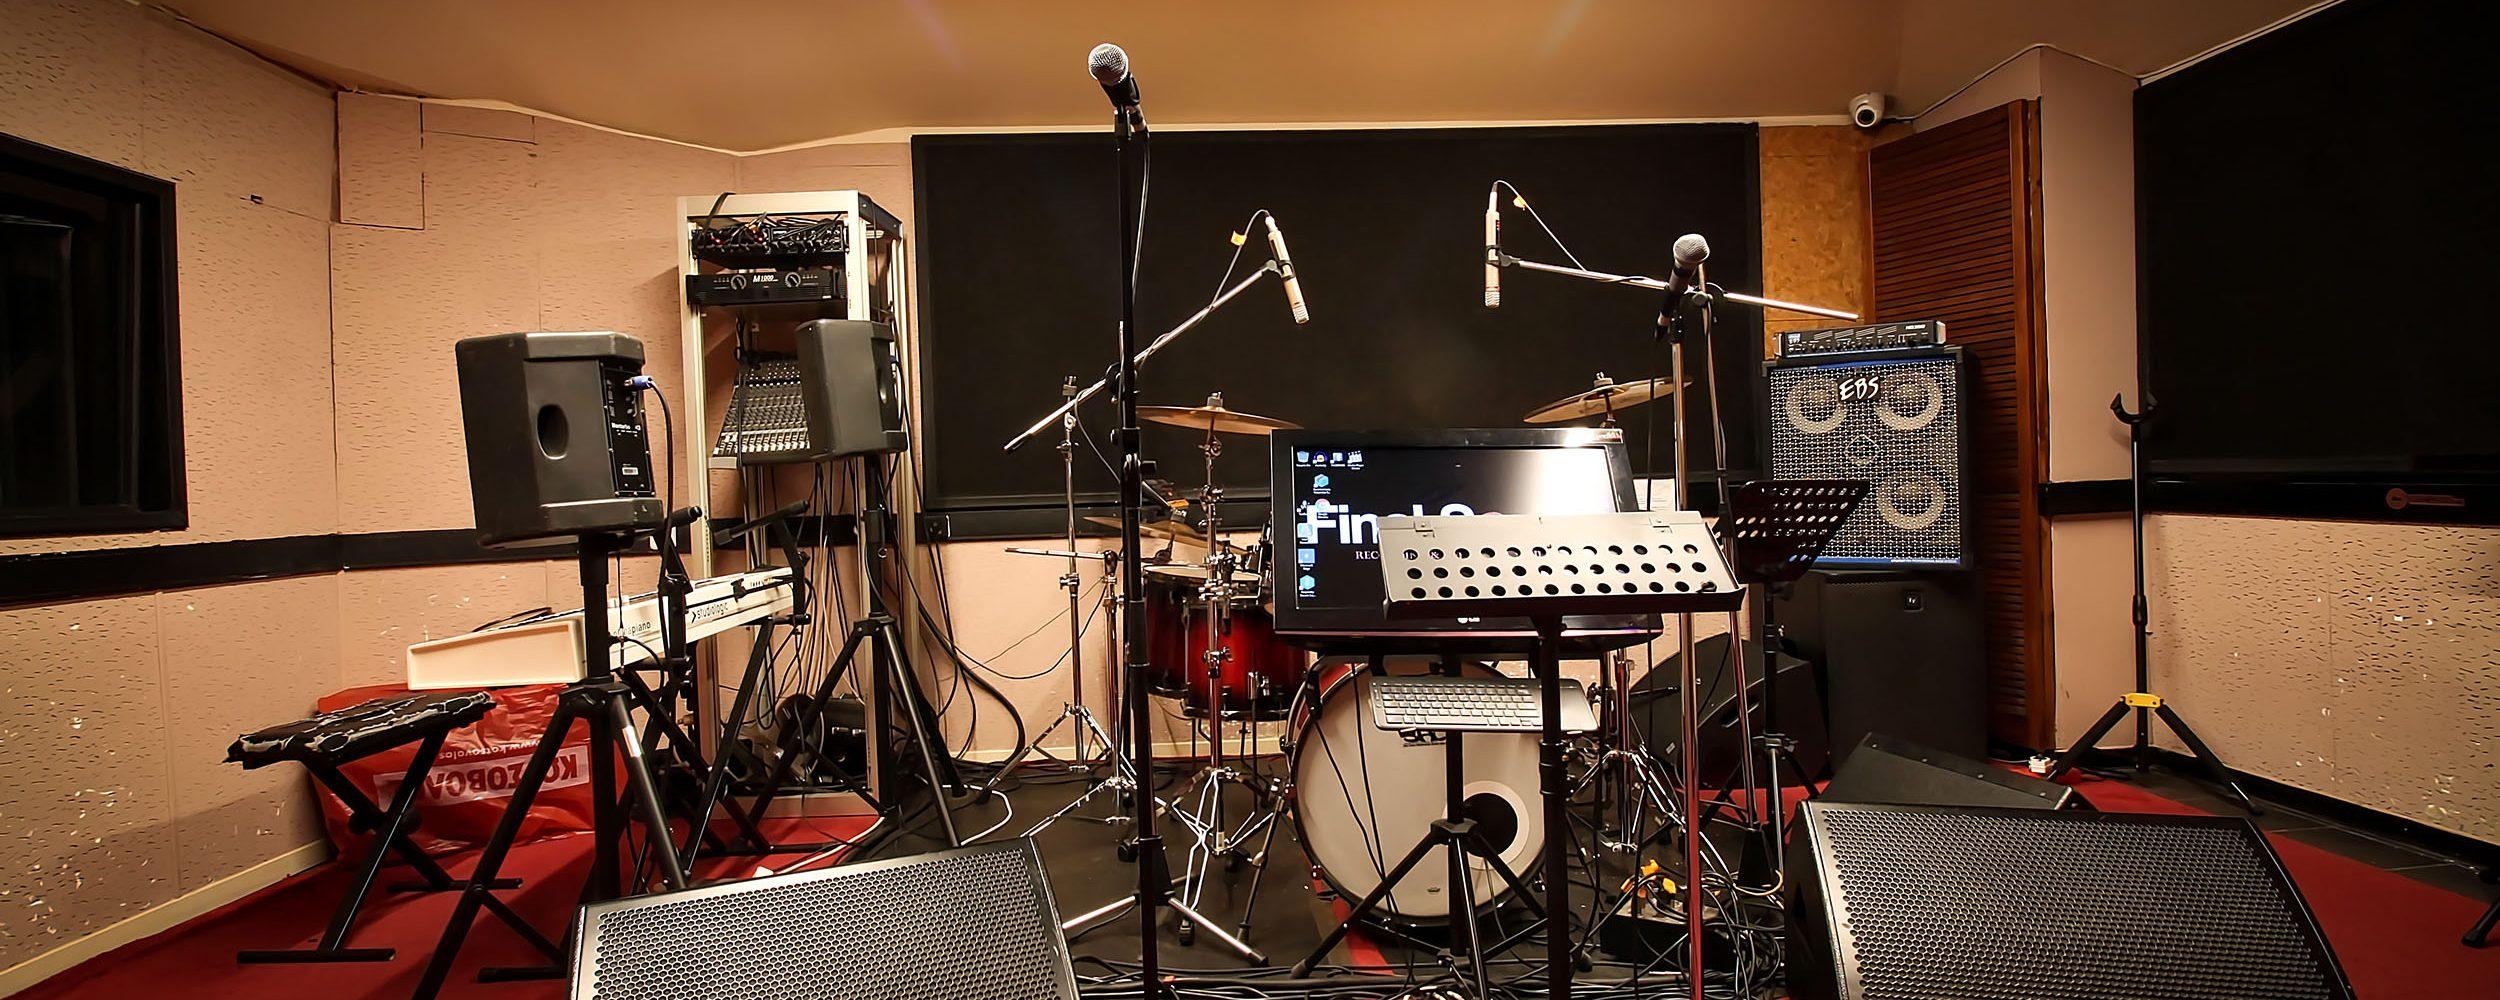 Final Sound Rehearsal 04